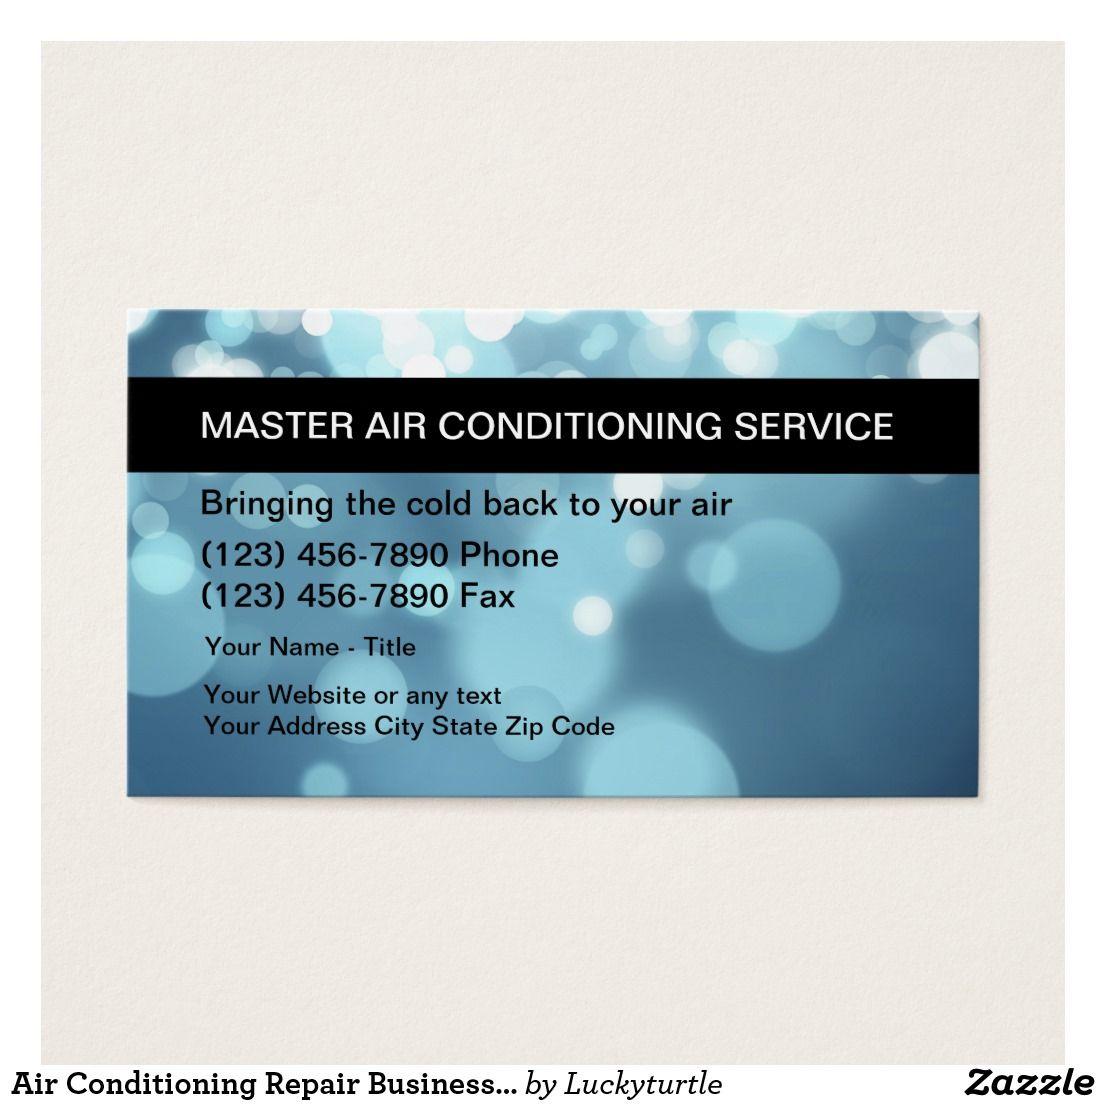 Air Conditioning Repair Business Cards Zazzle Com Vizitki